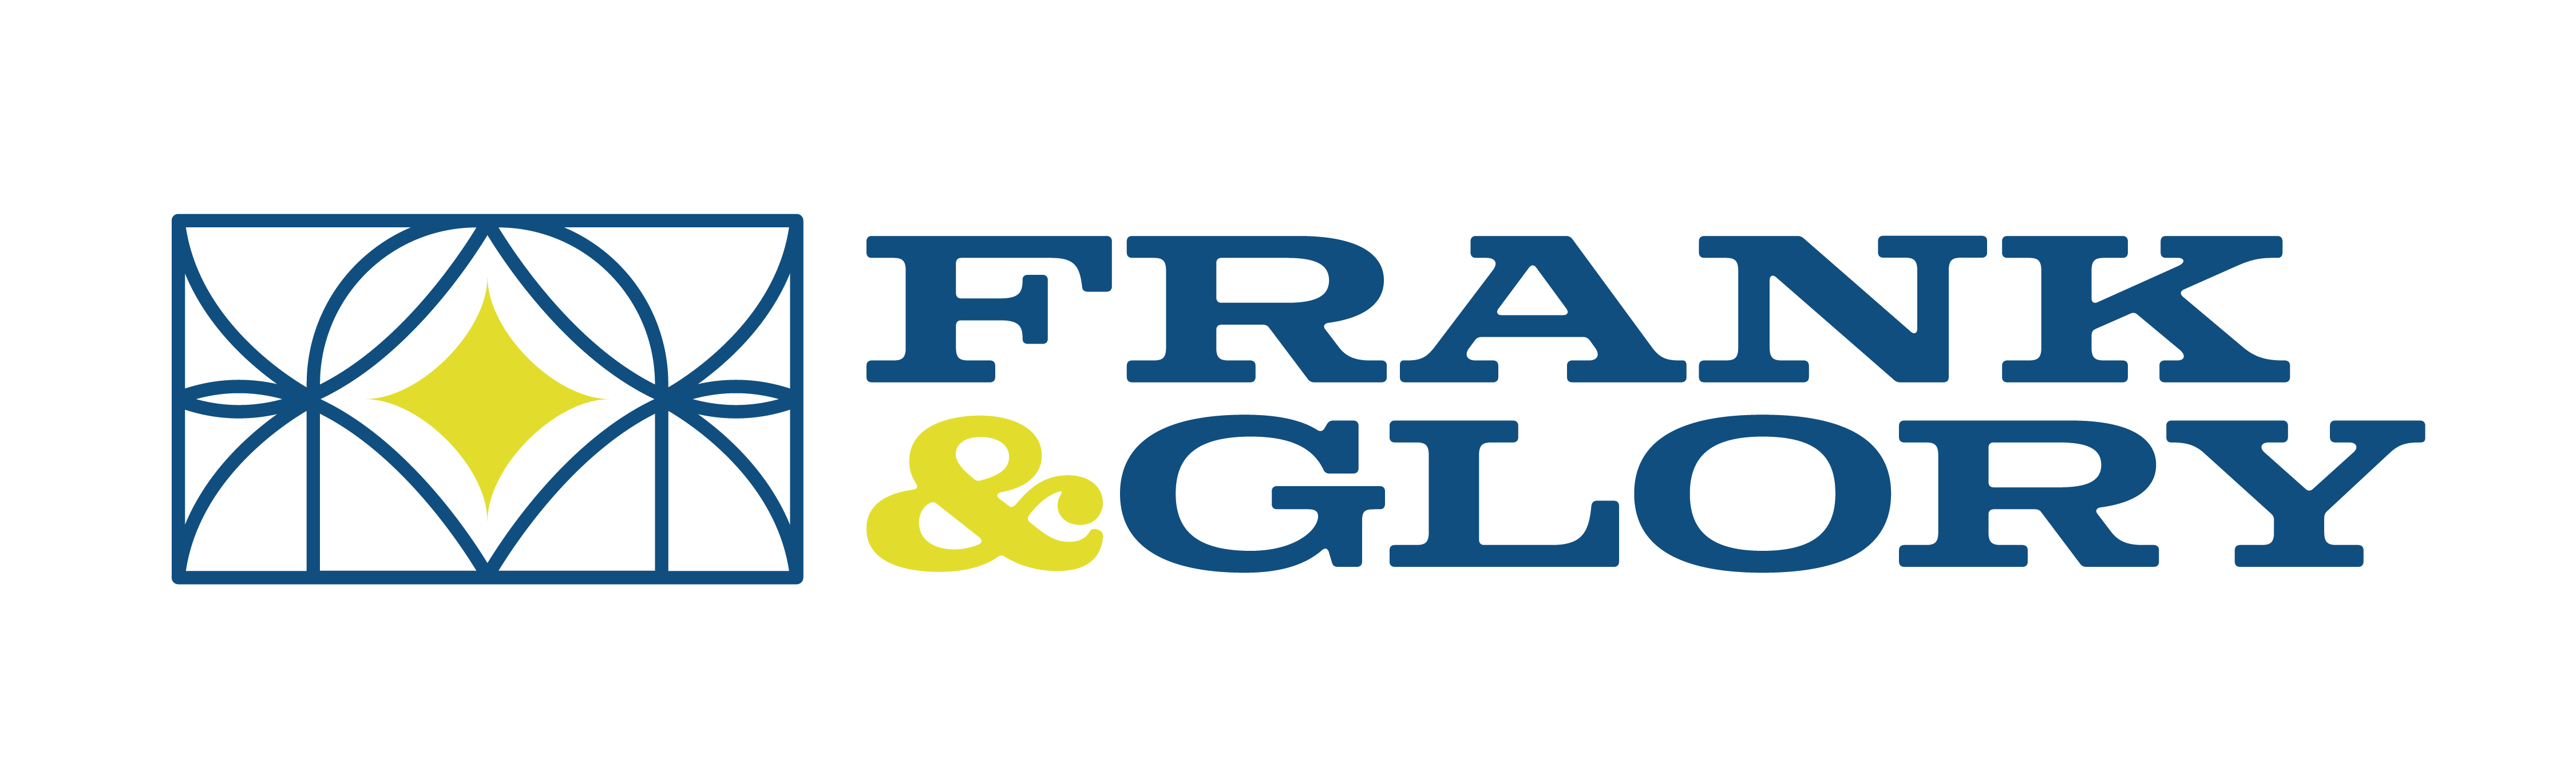 Frank & Glory